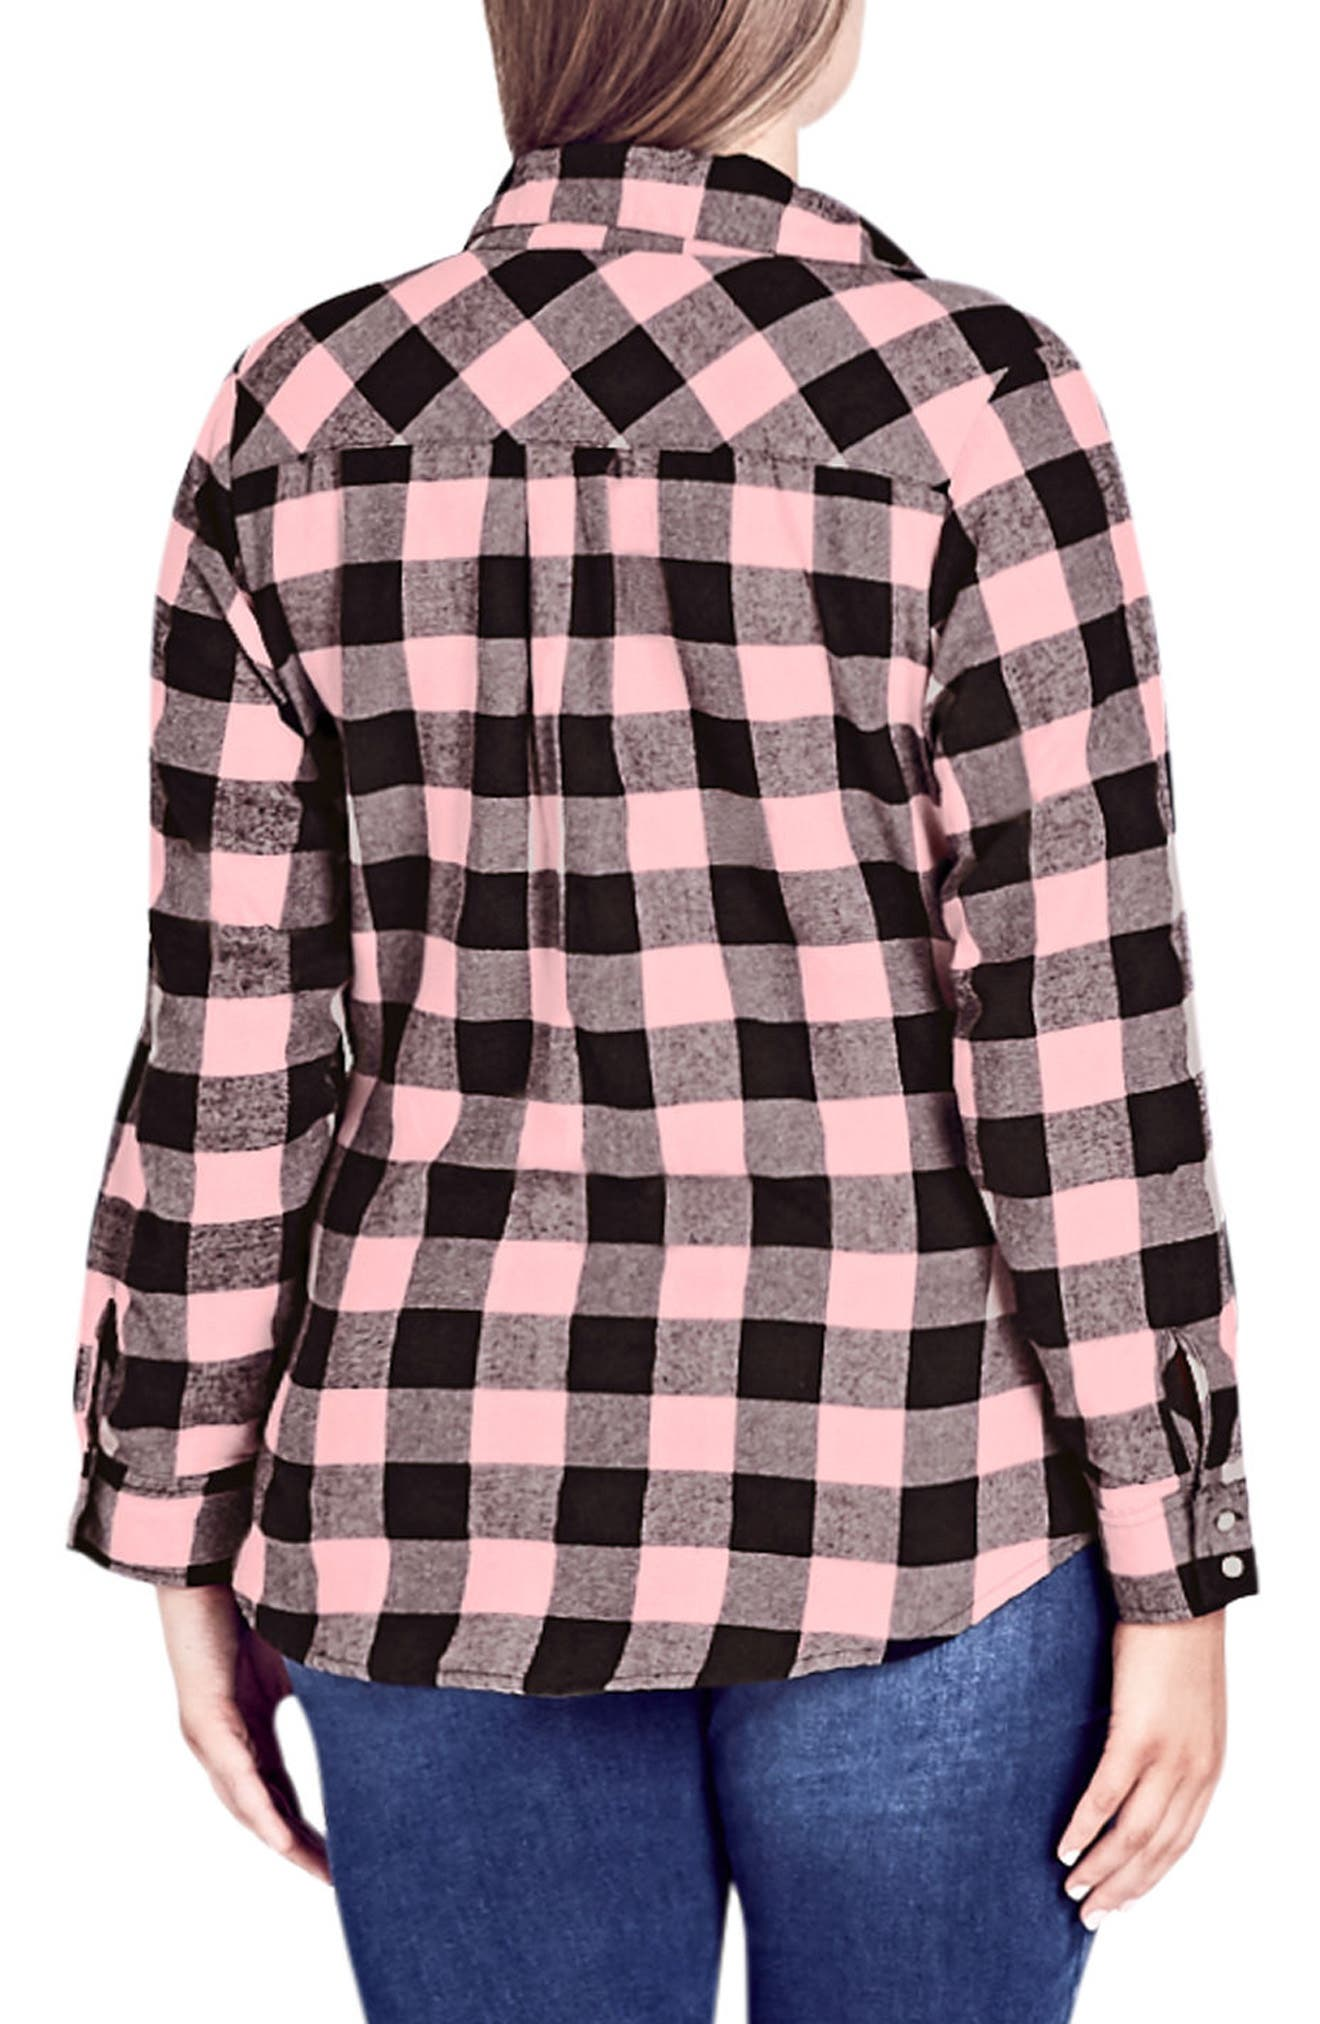 Dusty Duke Cotton Shirt,                             Alternate thumbnail 2, color,                             656